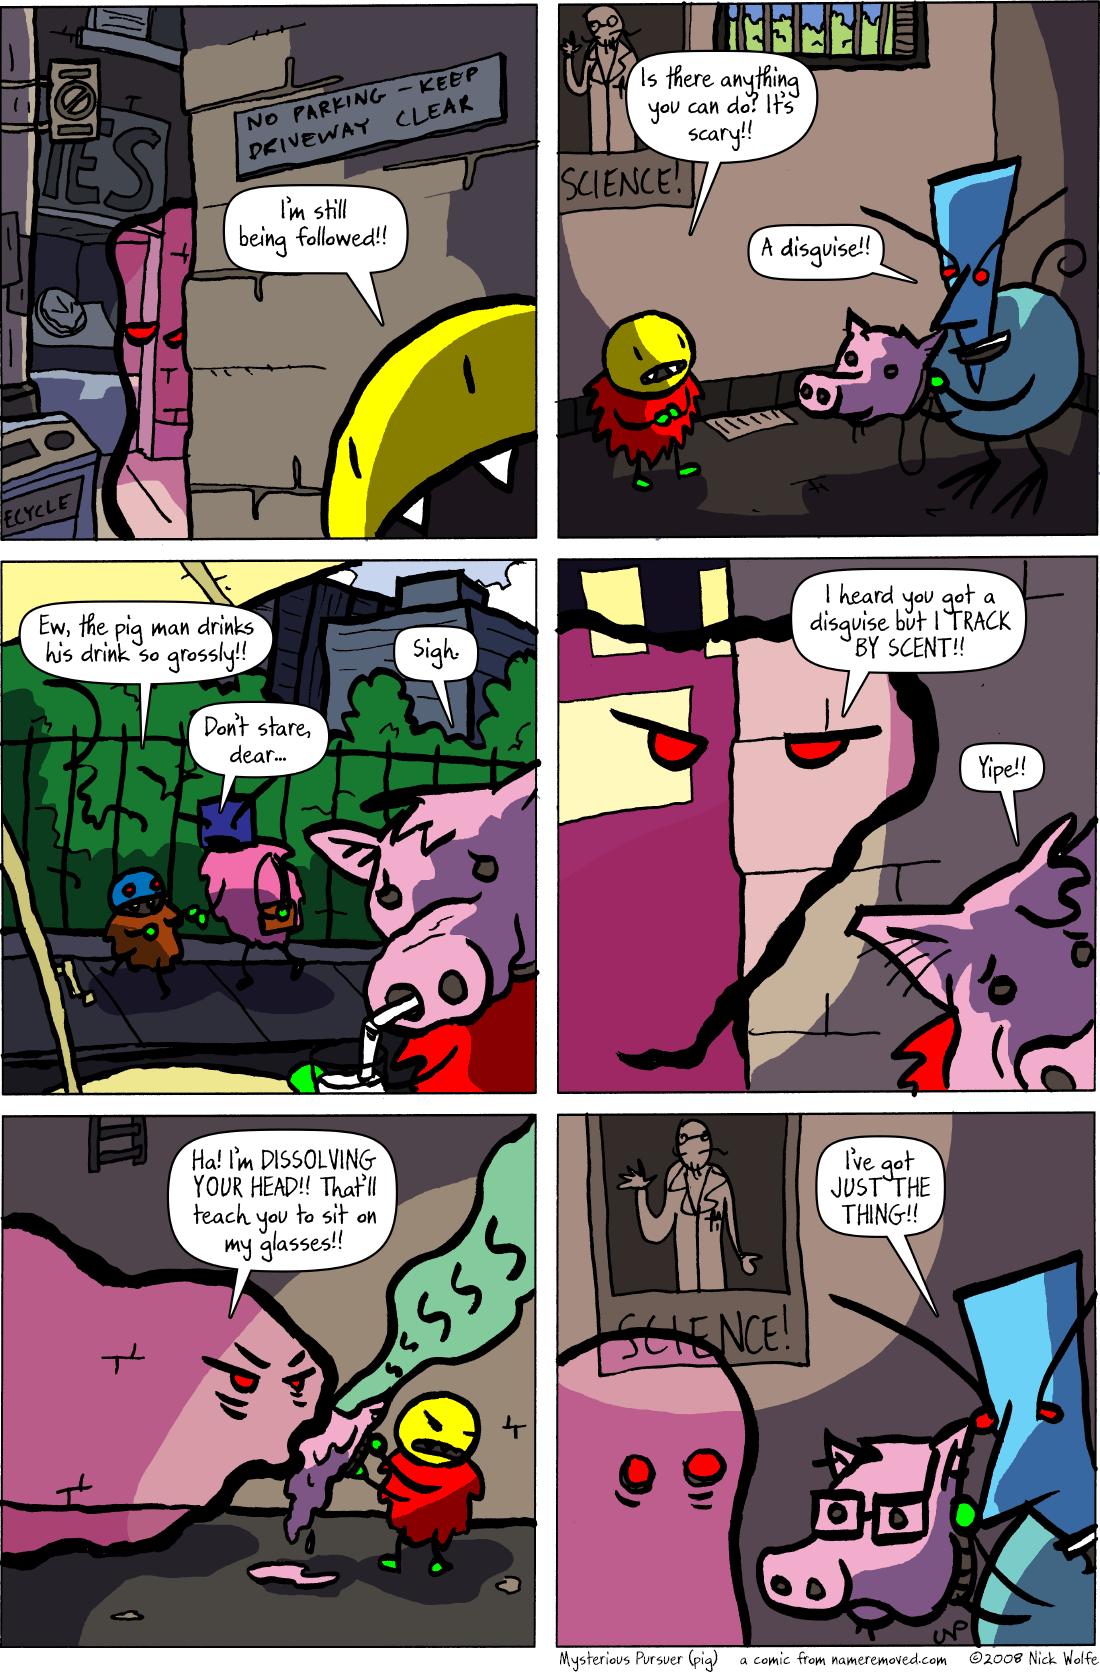 Mysterious Pursuer (pig)